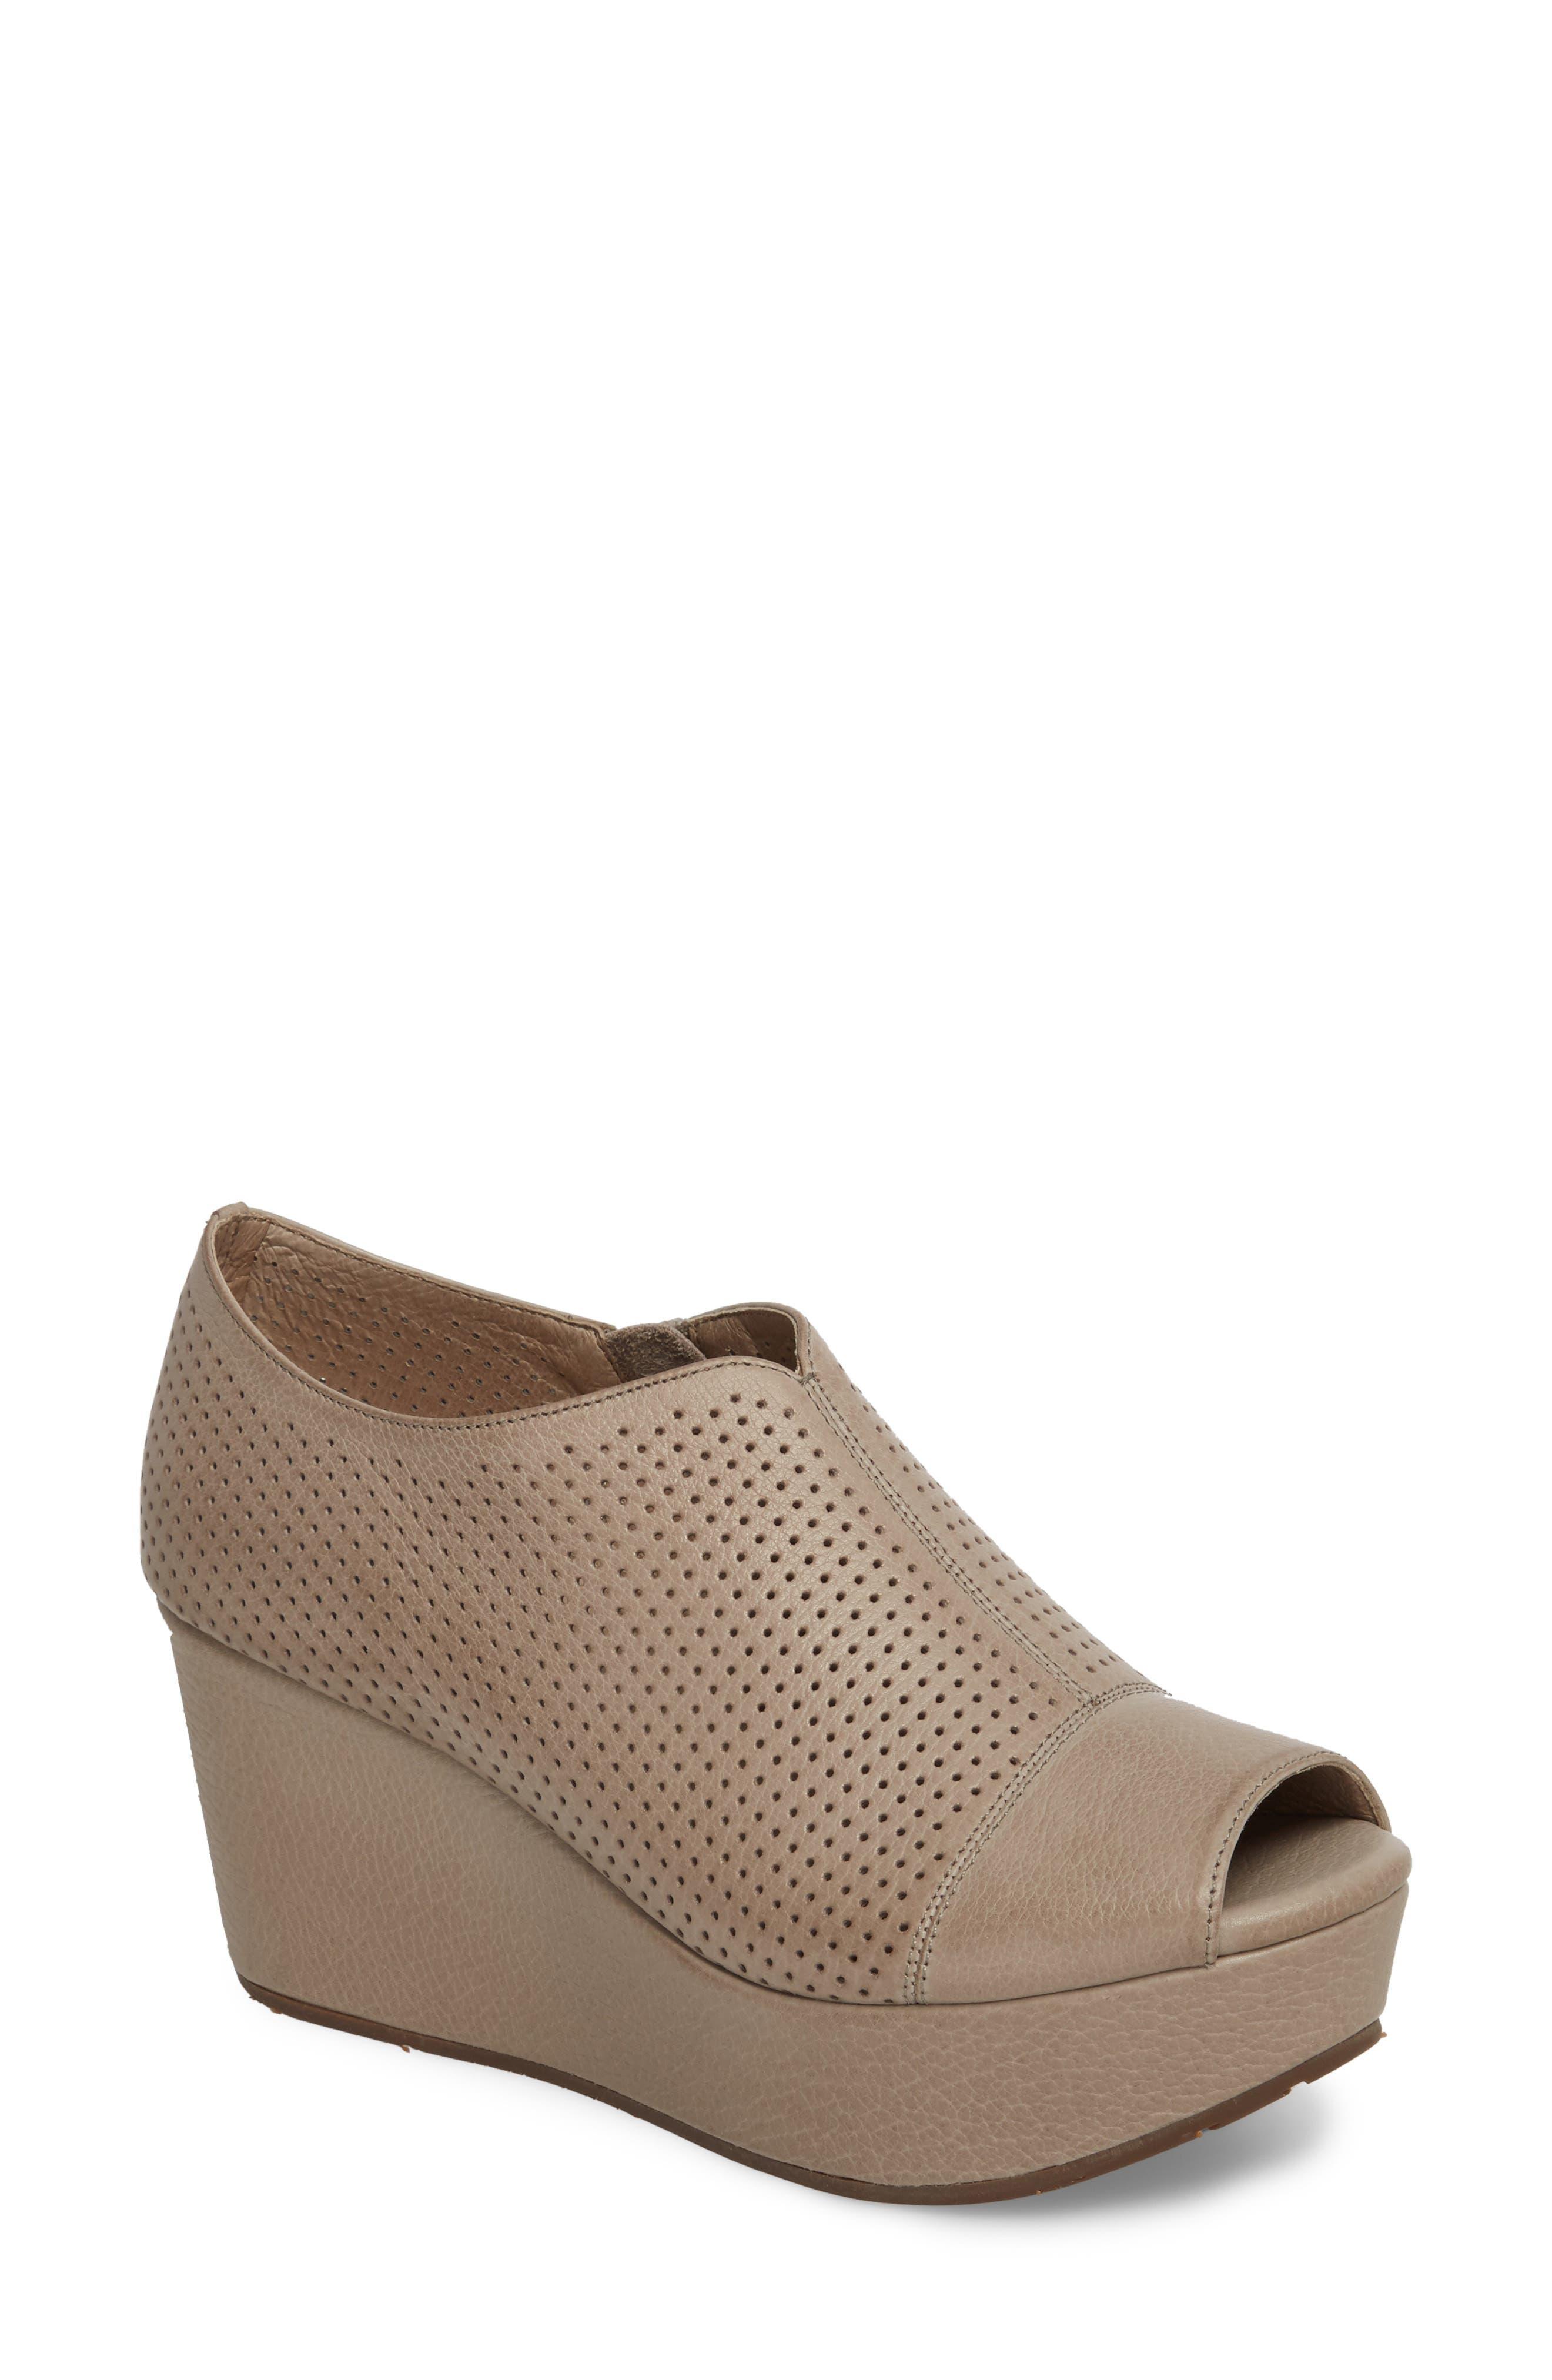 Wheeler Wedge Sandal,                         Main,                         color, Grey Leather